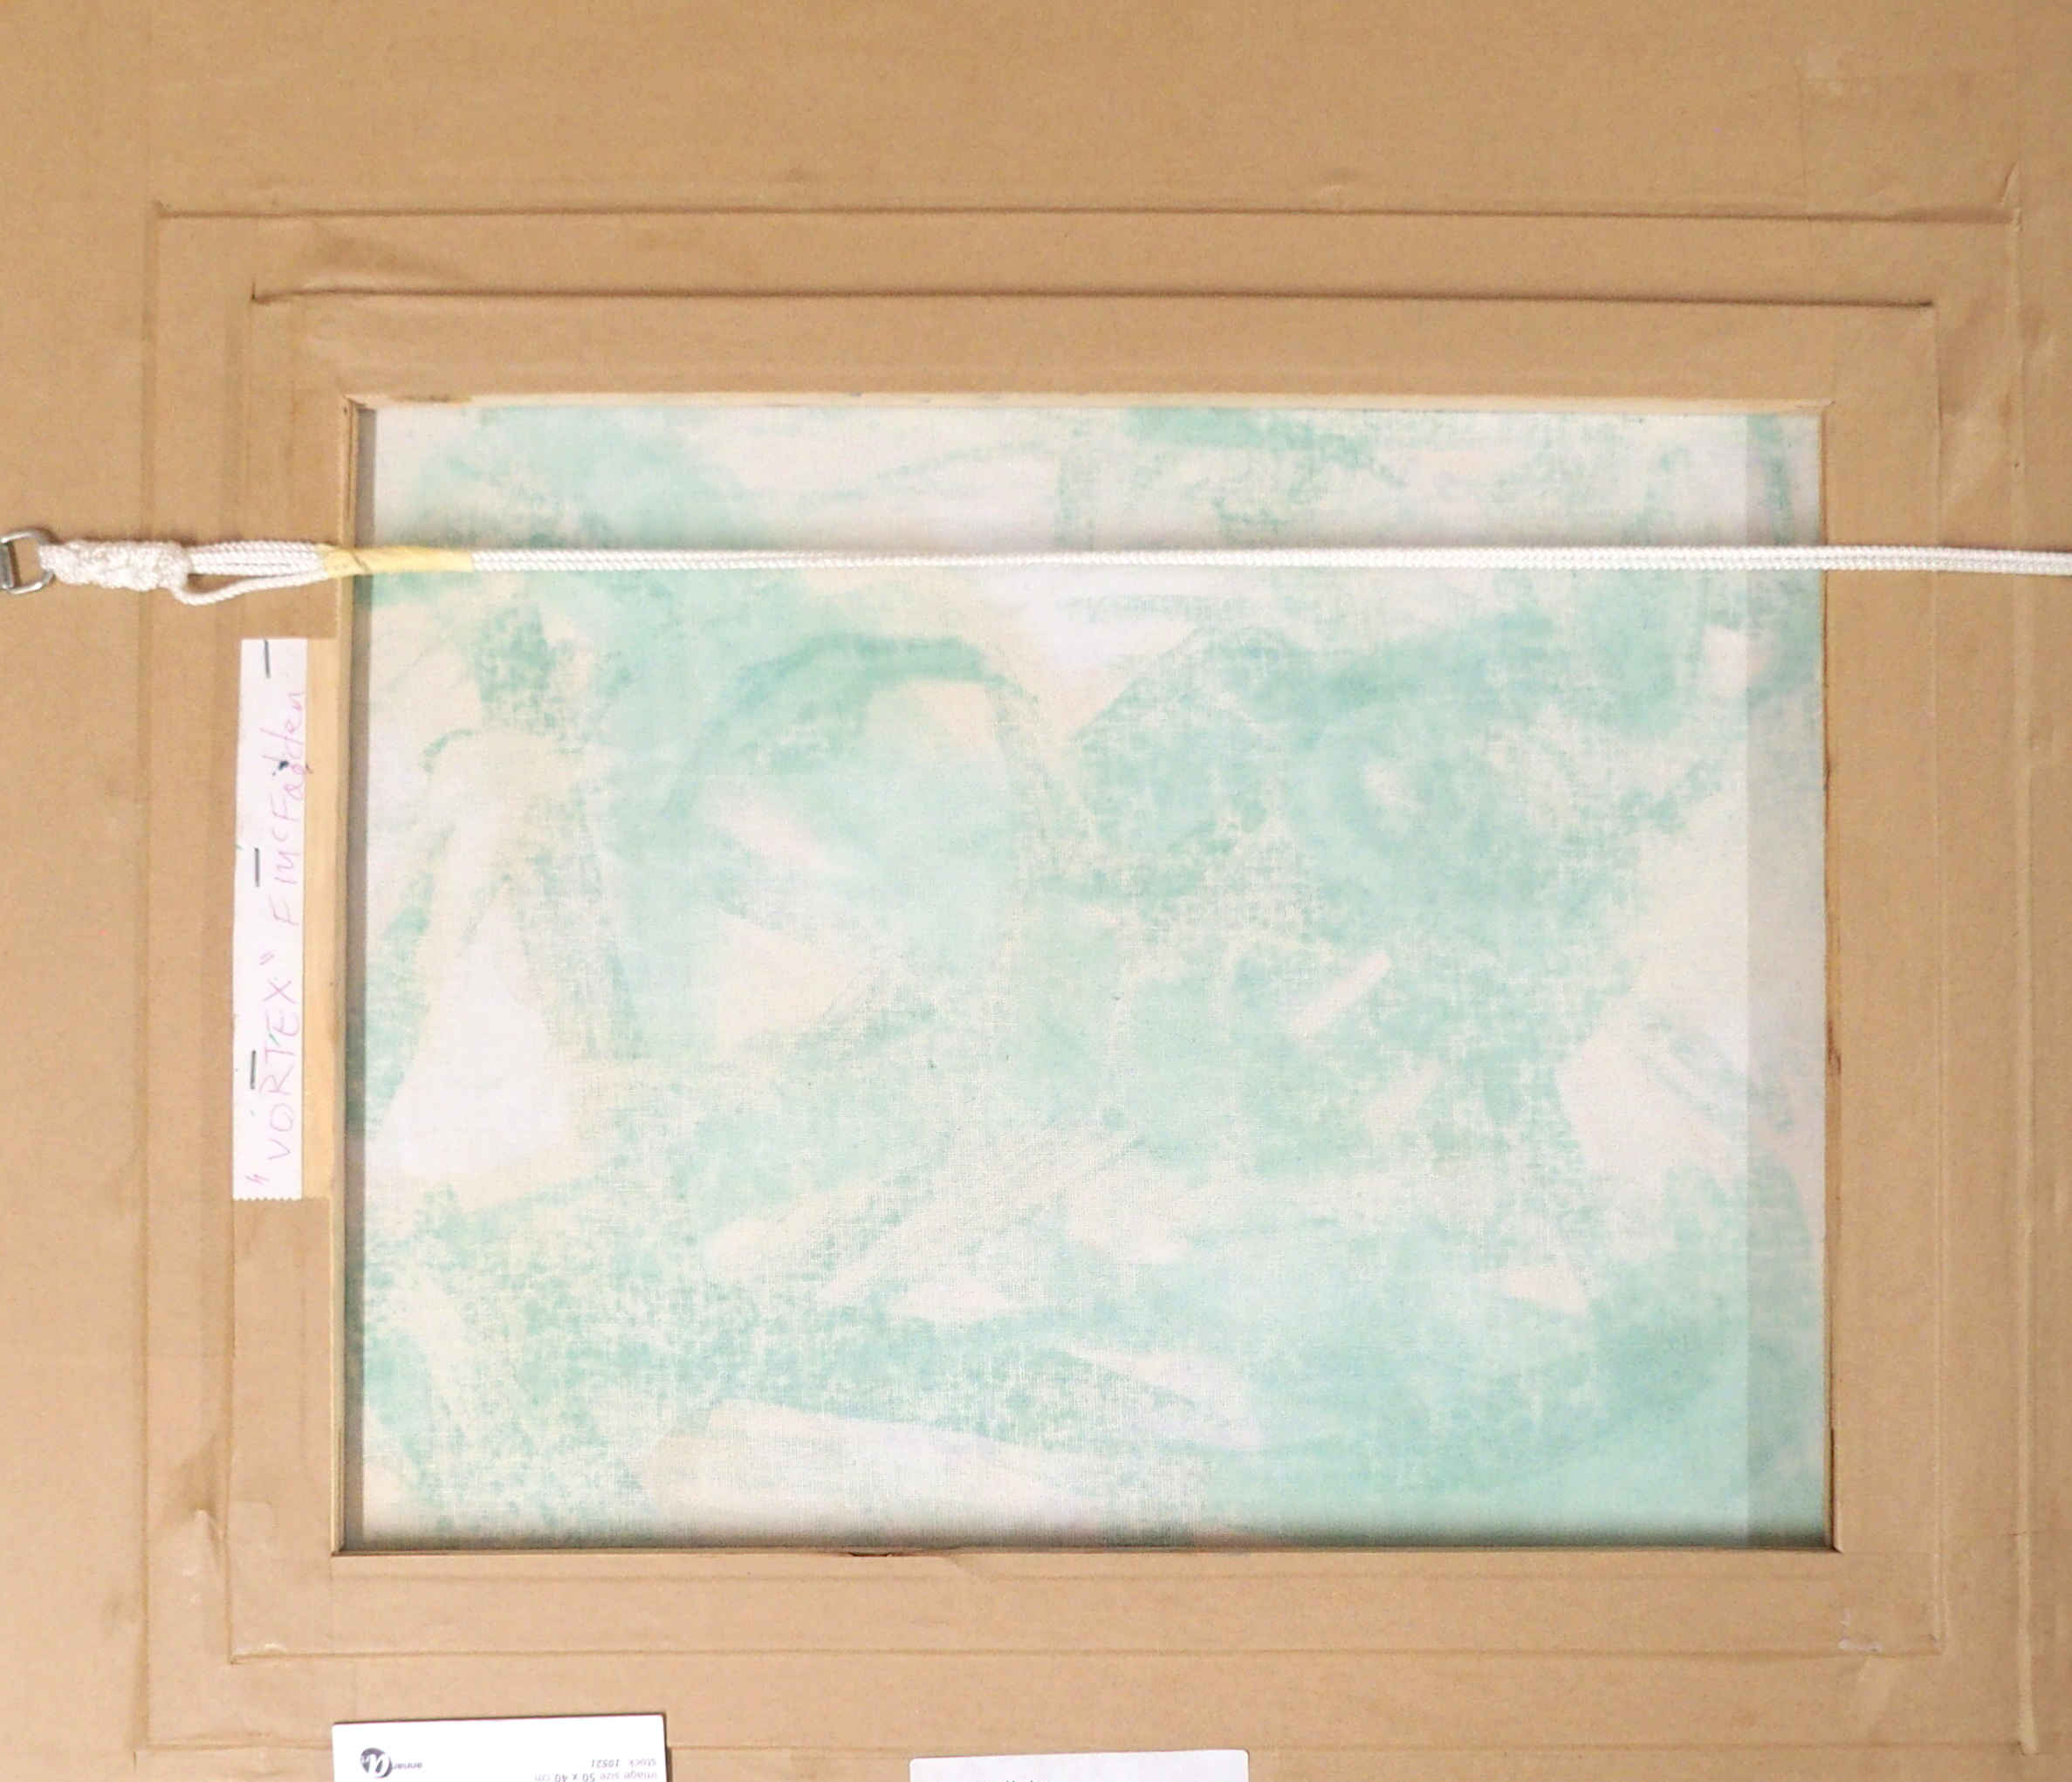 "•FRANK MCFADDEN (SCOTTISH B. 1972) VORTEX Oil on canvas, signed, 40 x 50cm (15 3/4 x 19 3/4"") - Image 6 of 7"